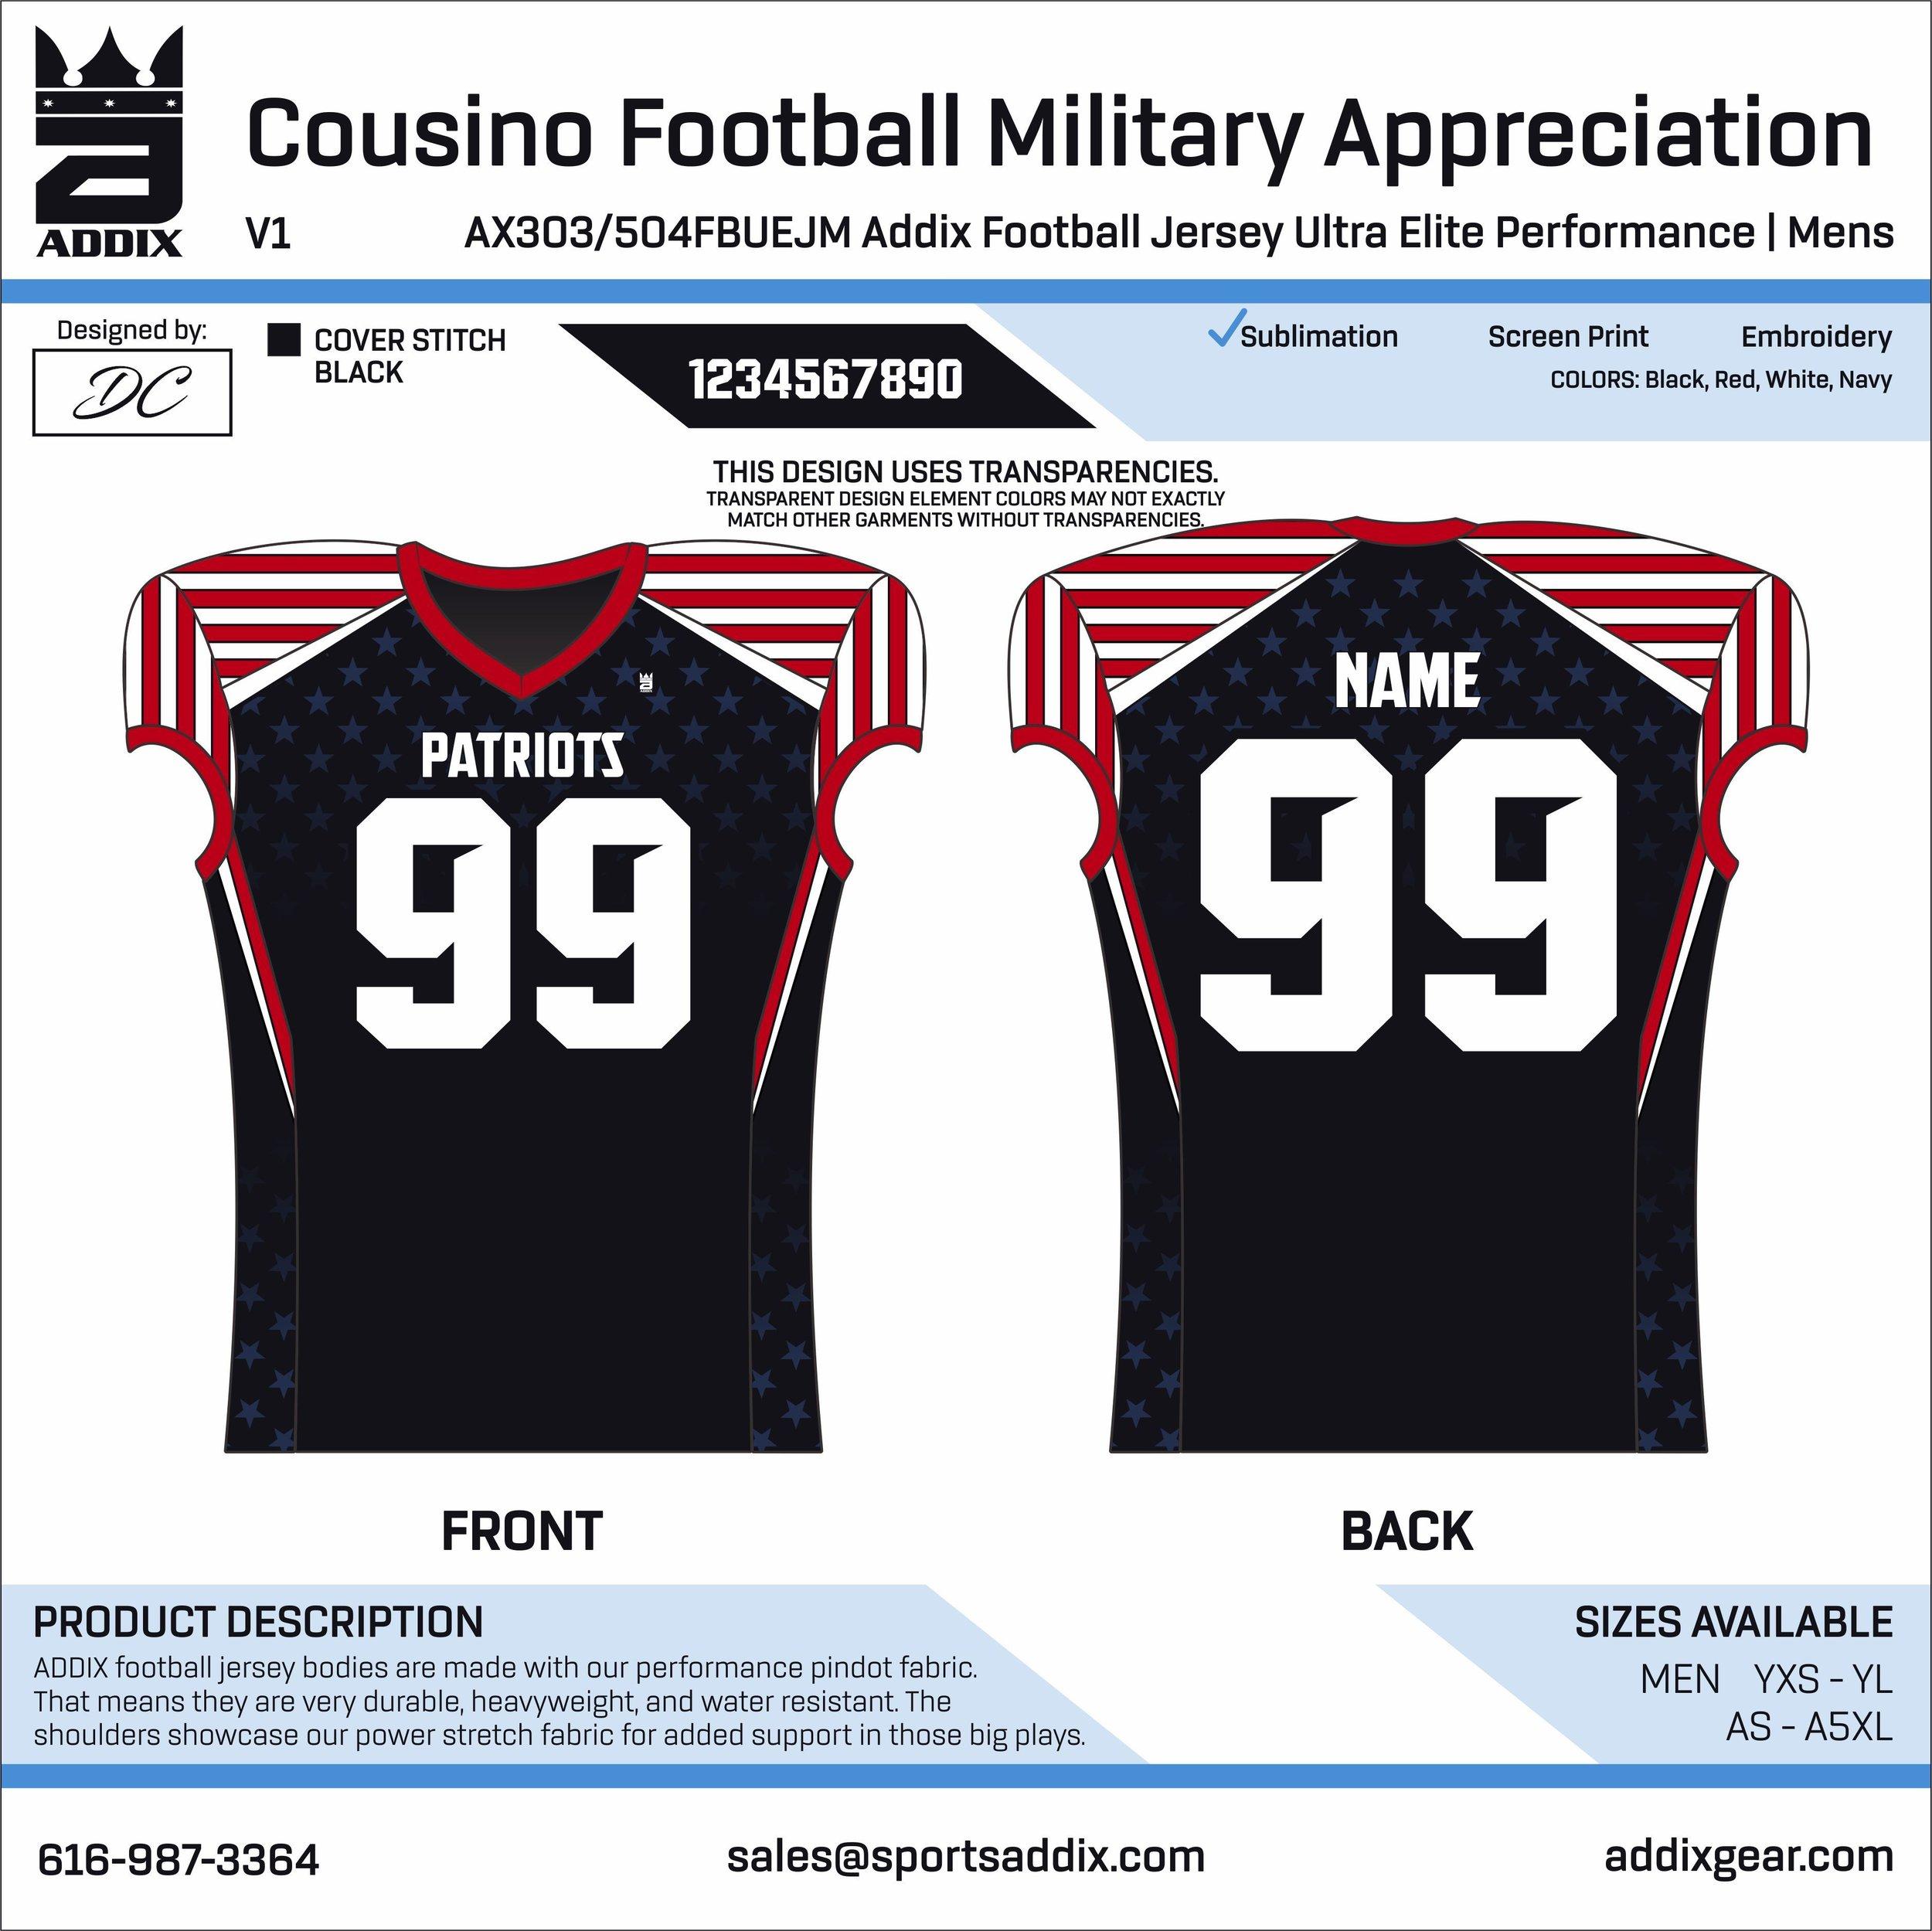 Cousino Football Military Appreciation_2019_8-14_DC_UEP Jersey.jpg